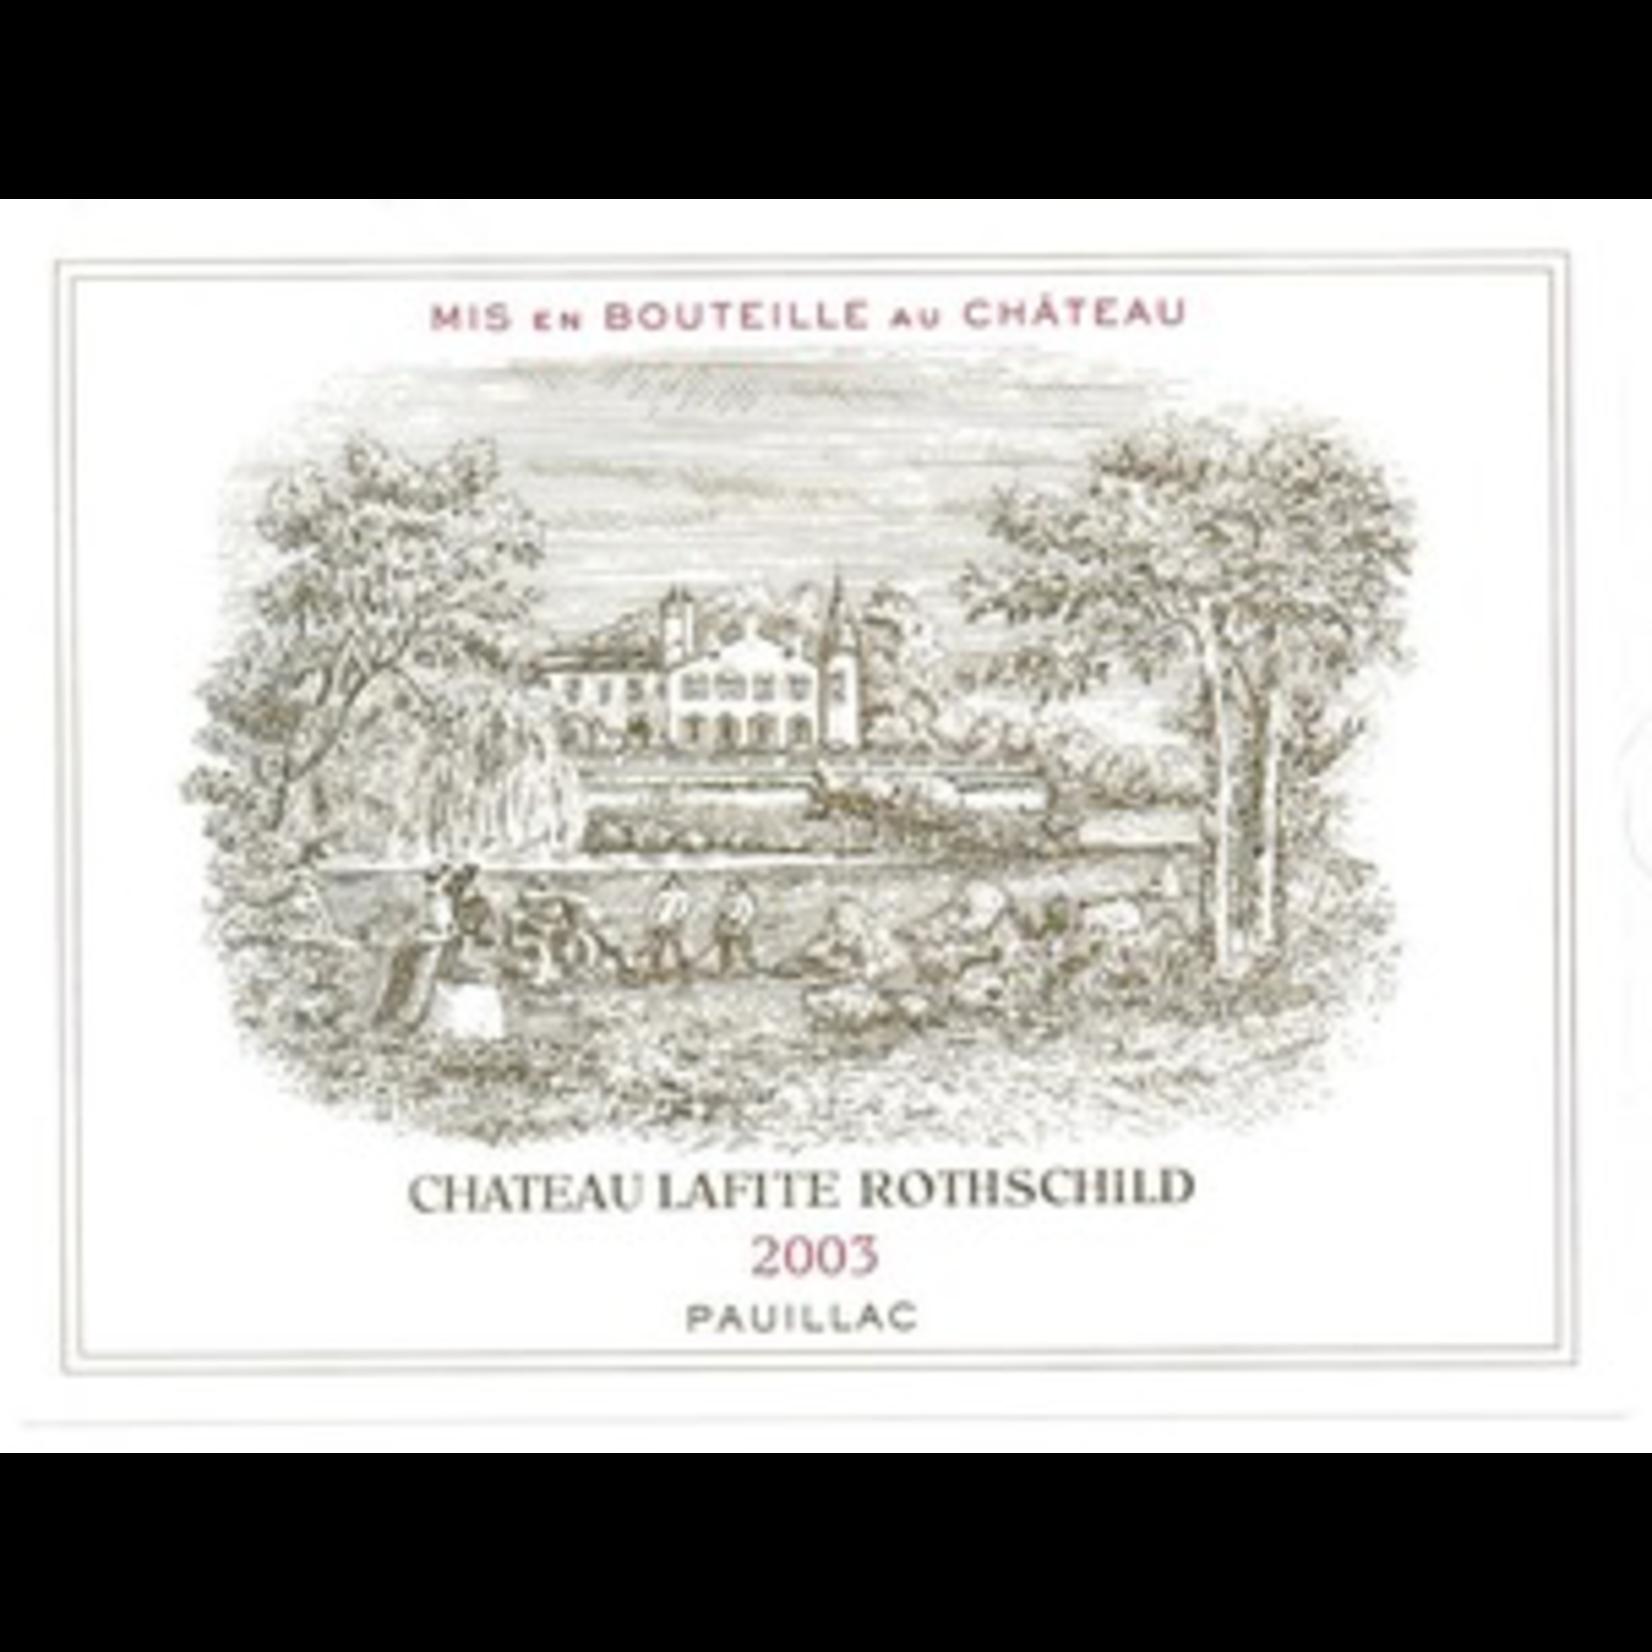 Chateau Lafite Rothschild 2003